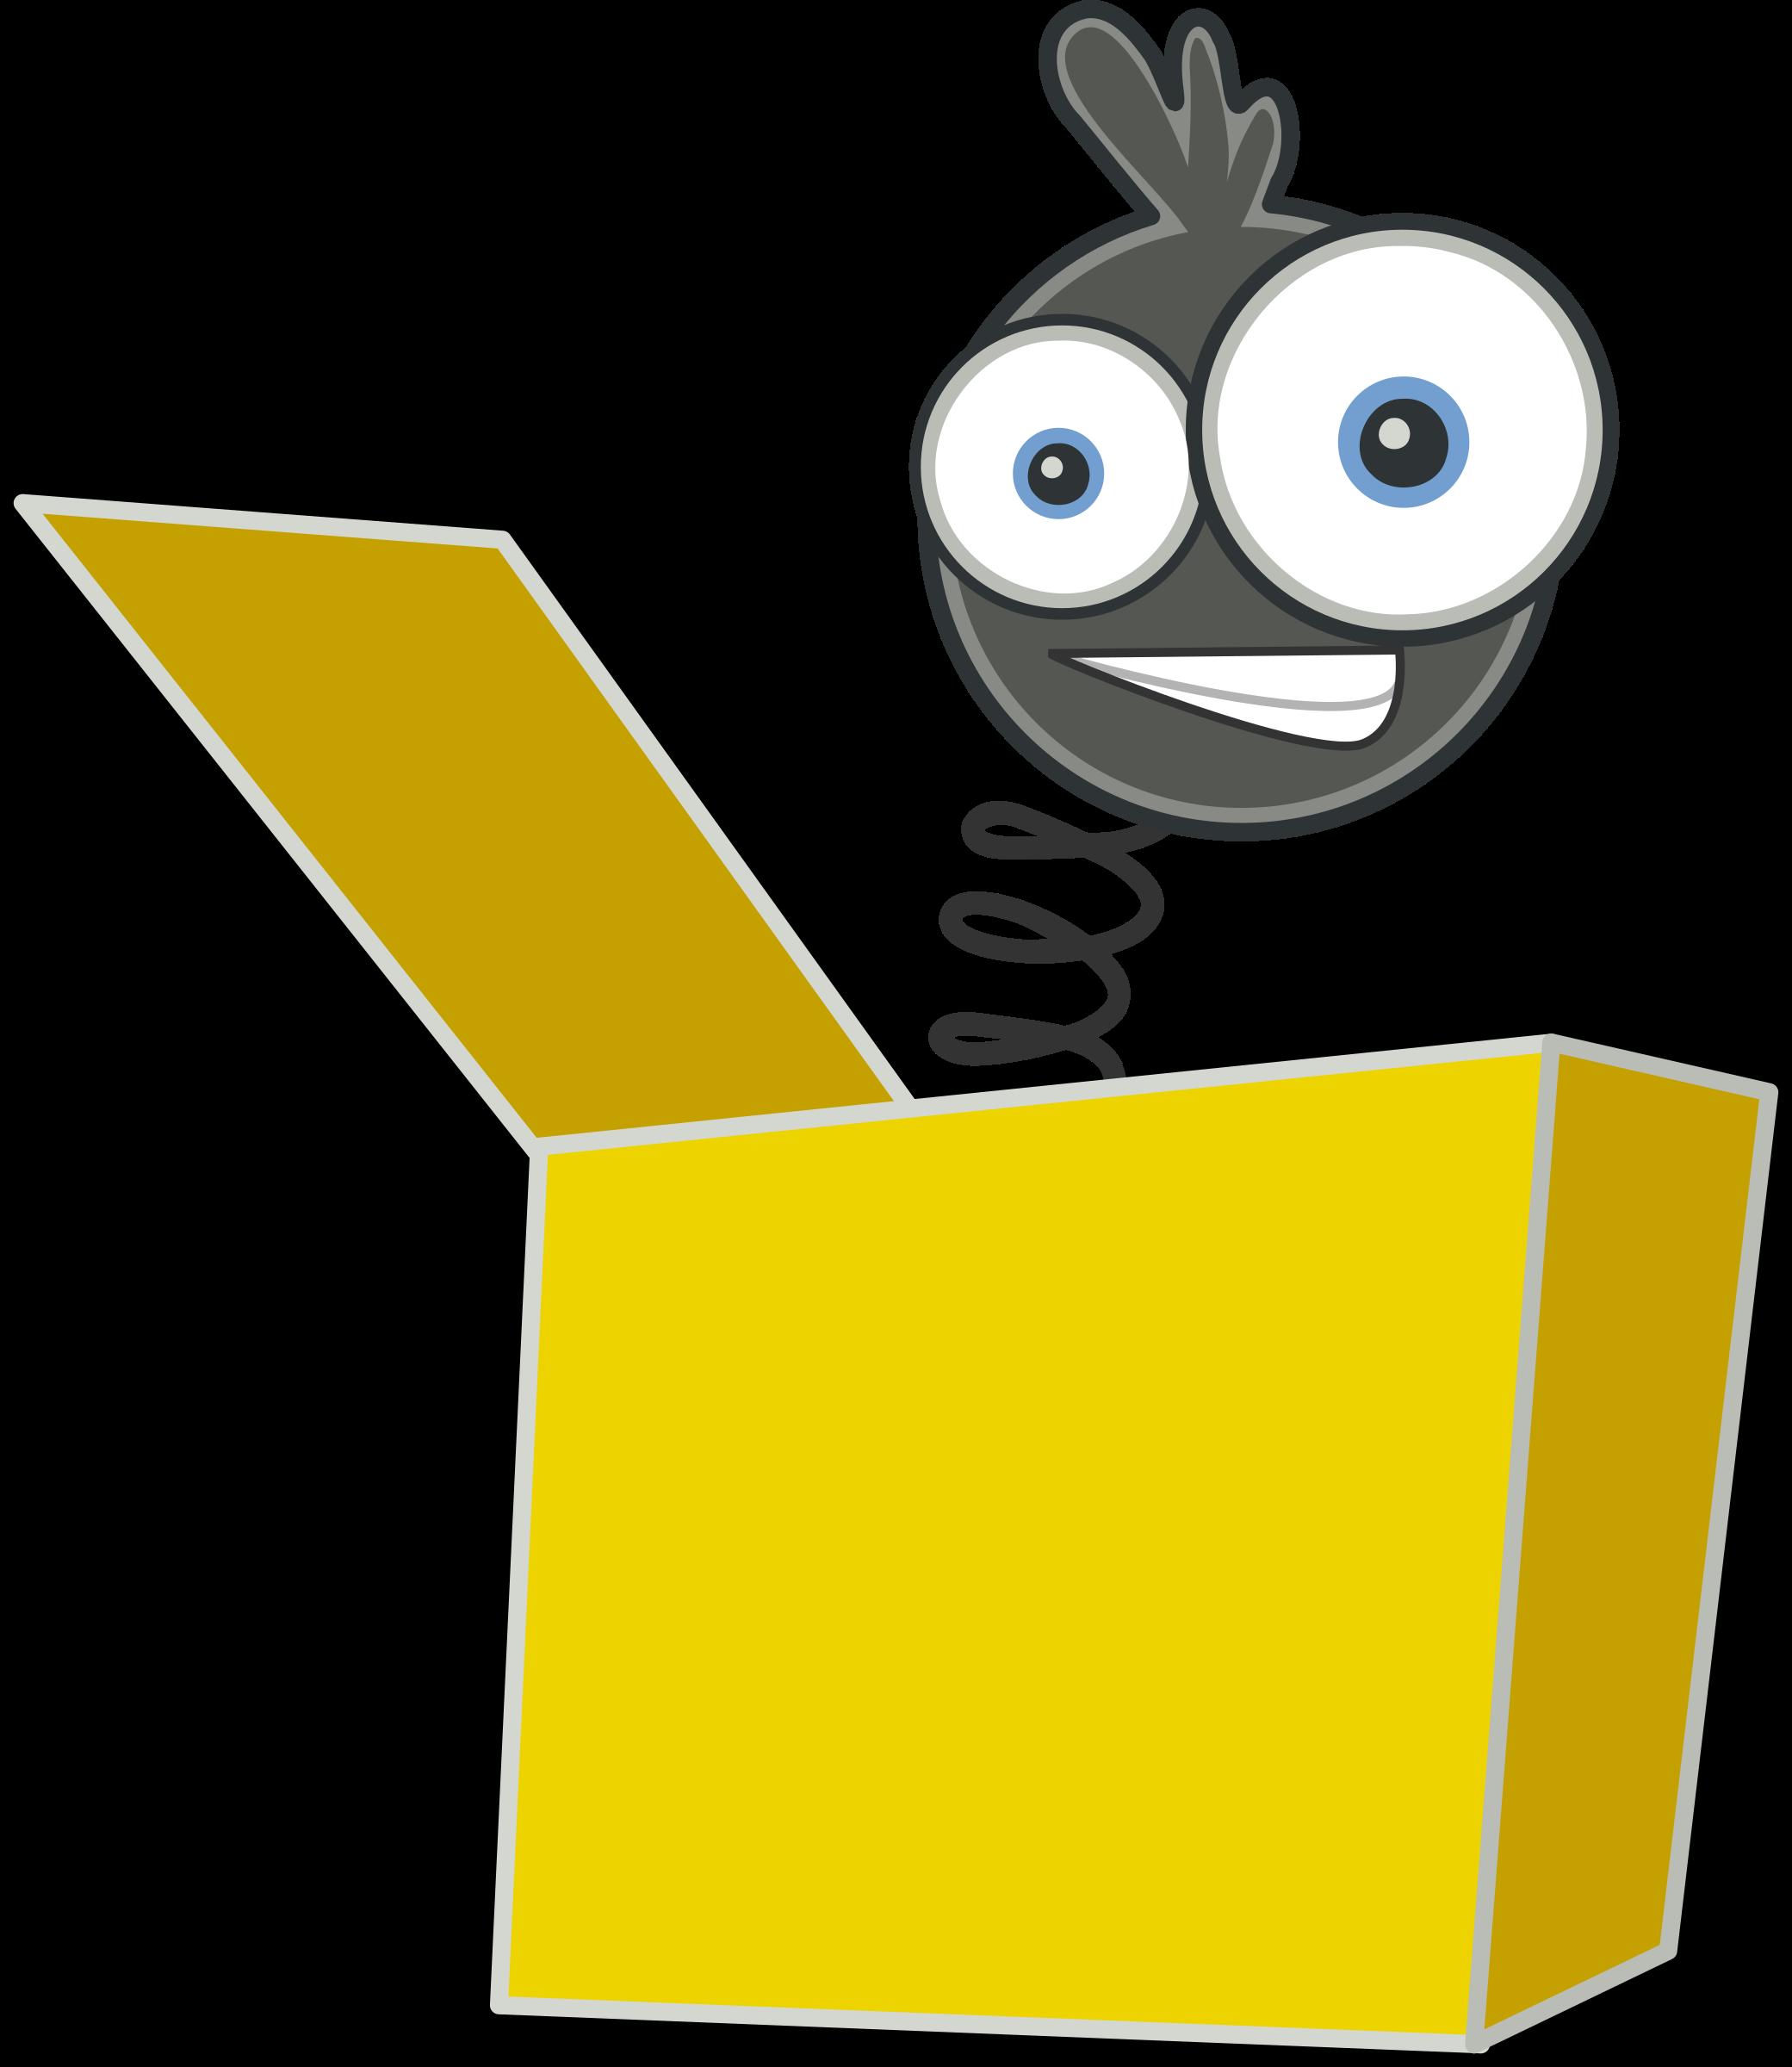 Joker clipart jack in box In the box Clipart box